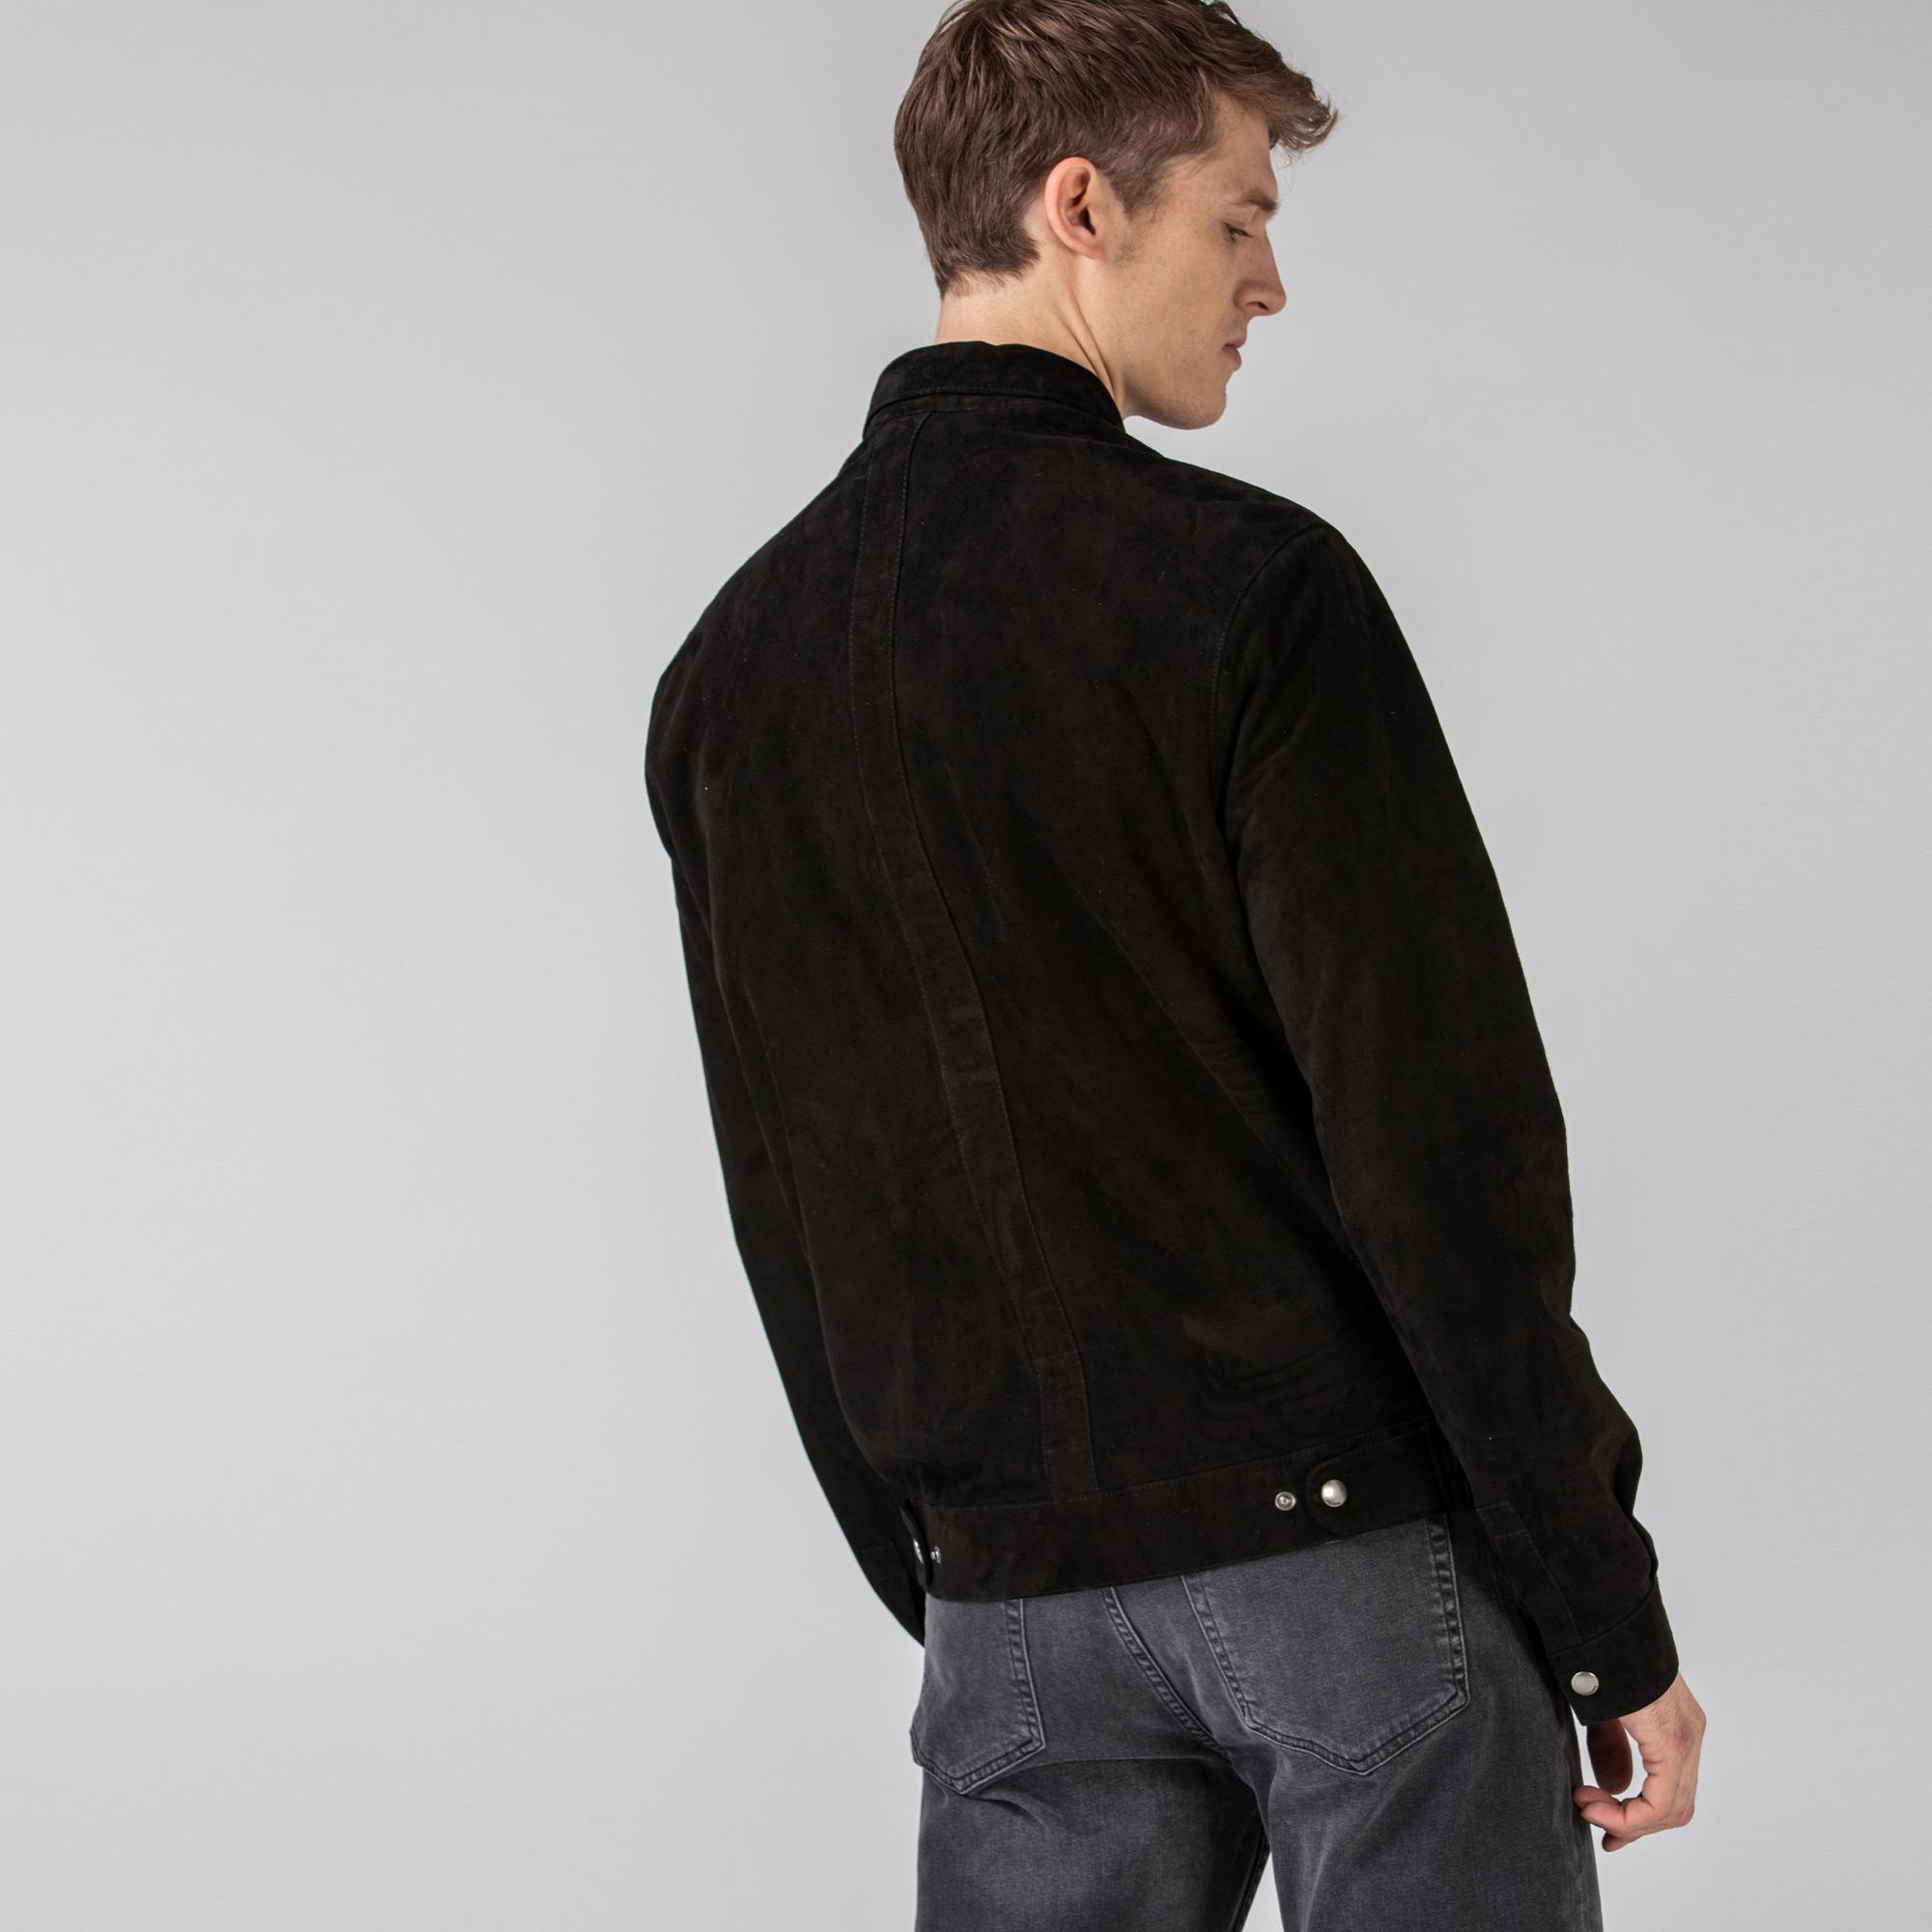 Lacoste Erkek Gömlek Yaka Deri Siyah Ceket